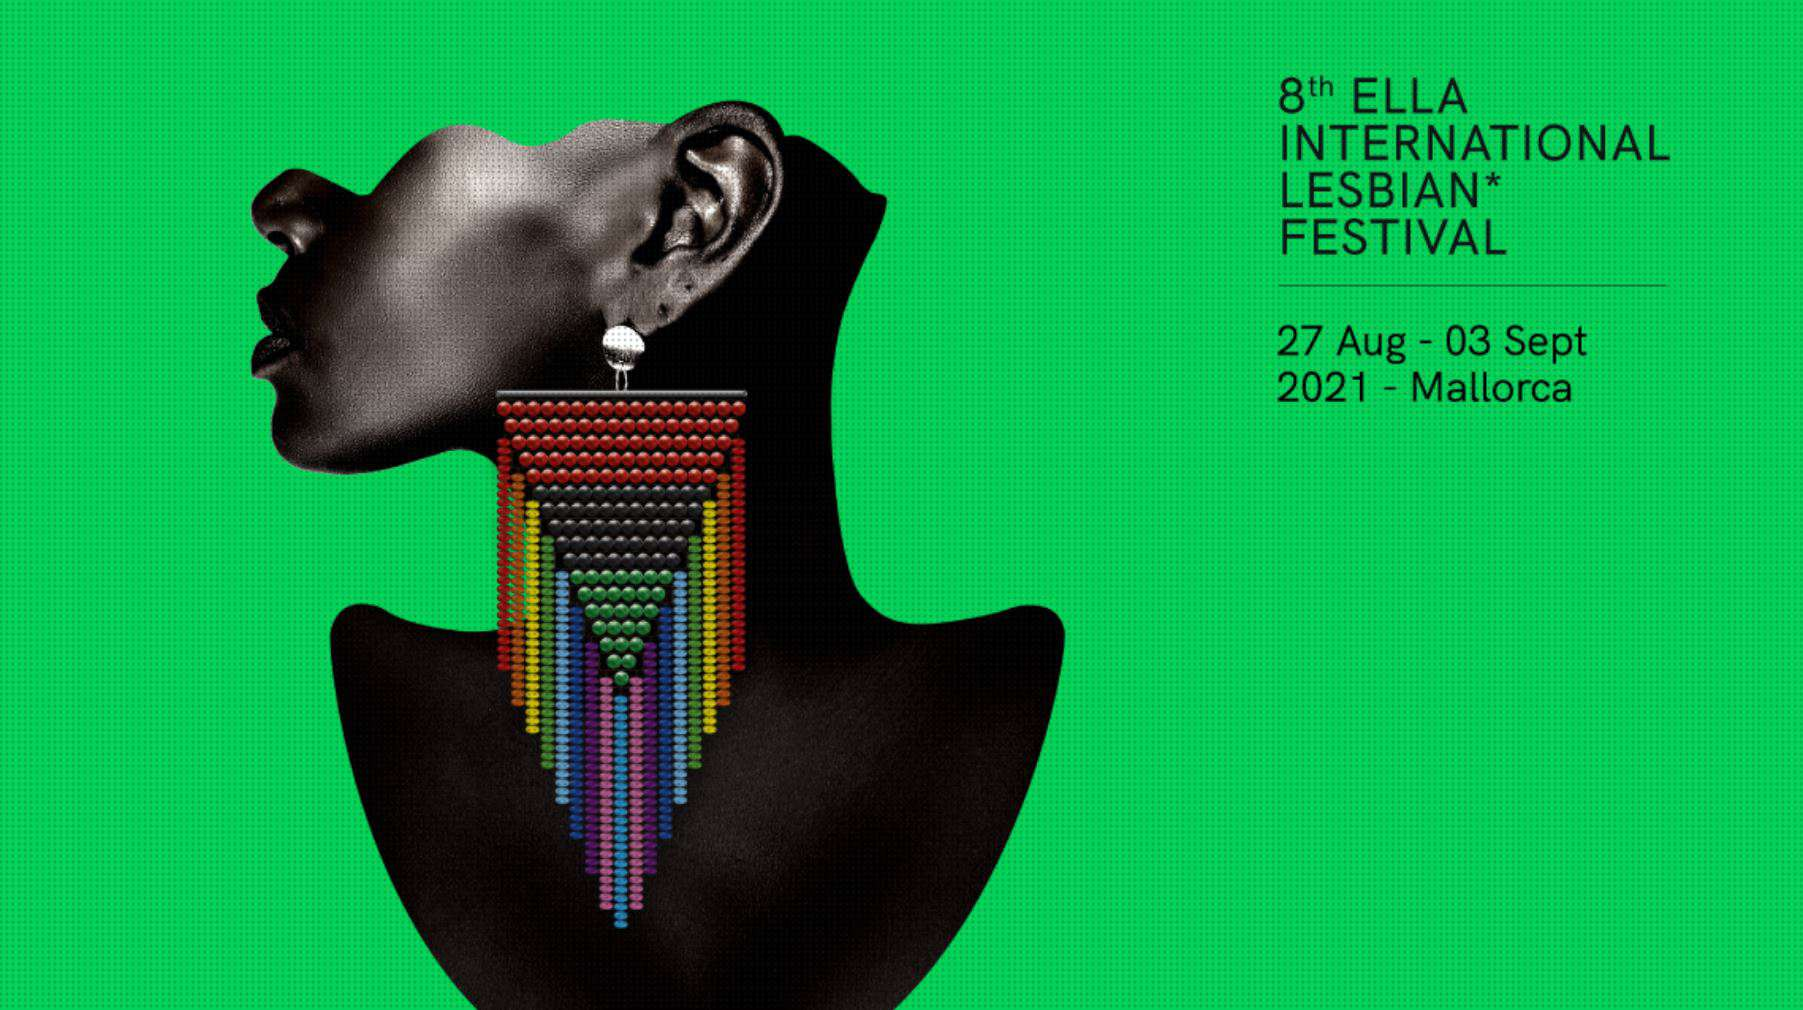 ELLA International Lesbian Festival – Mallorca